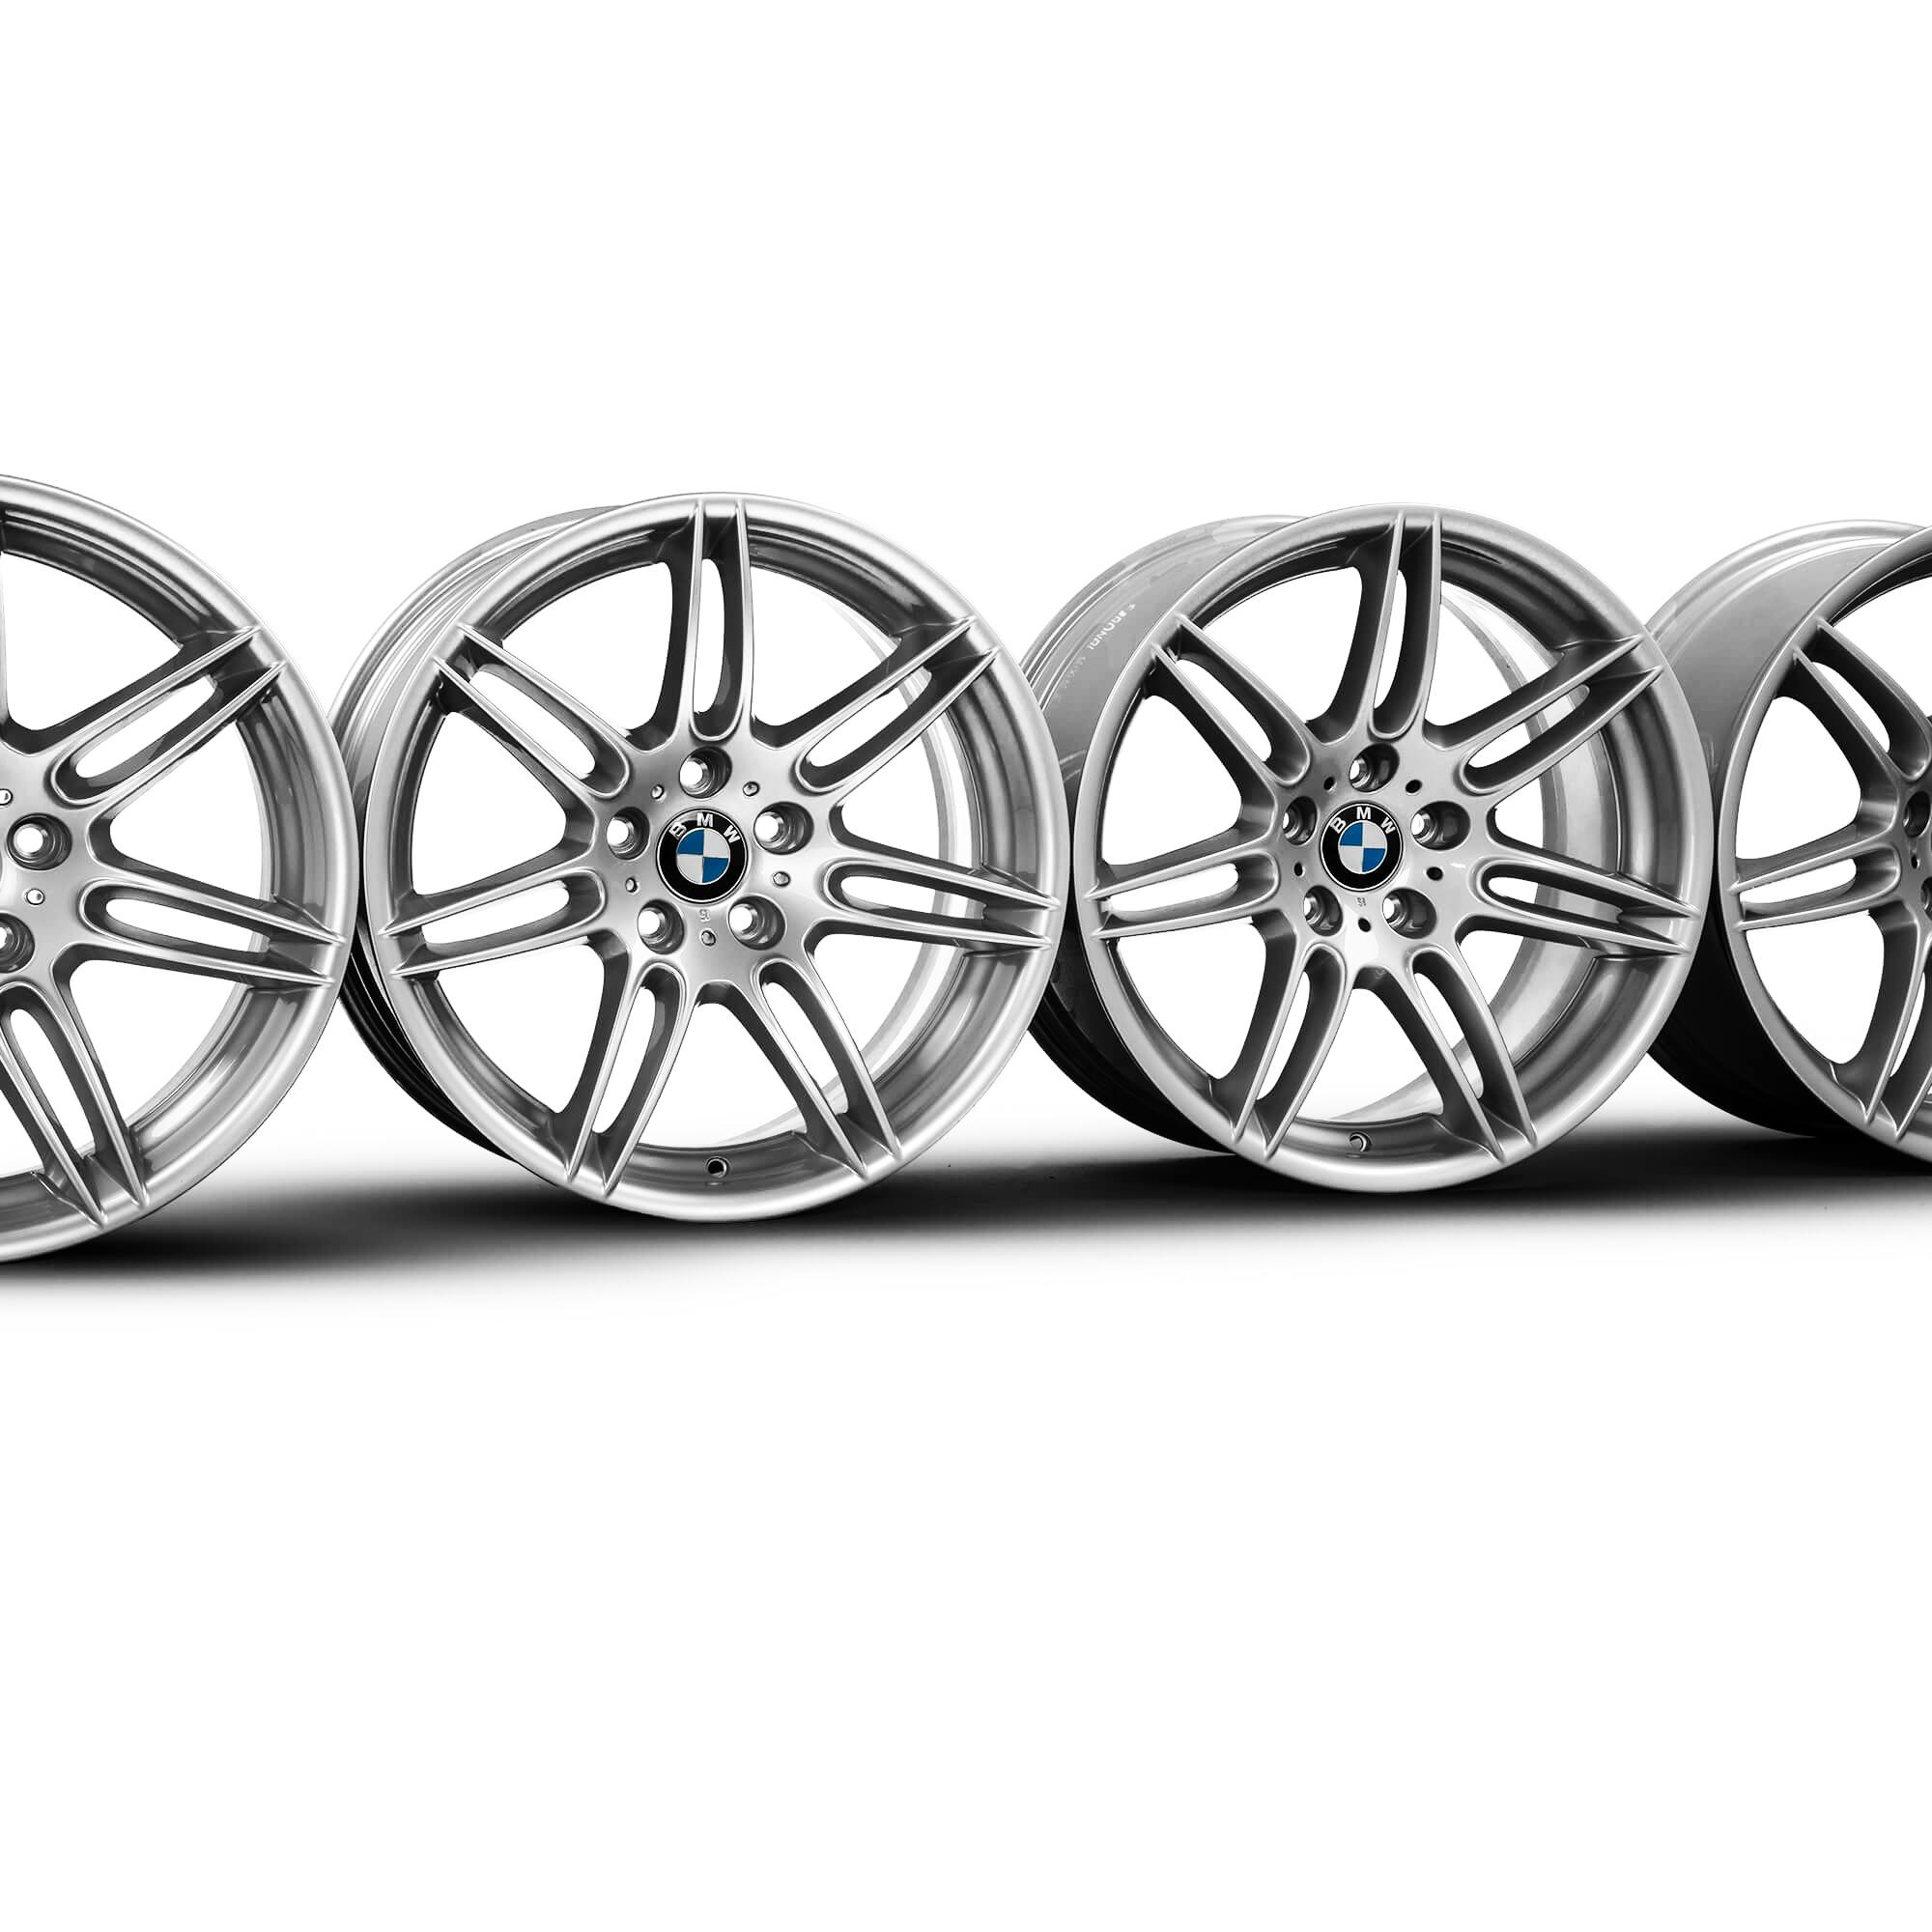 4x Bmw 19 Inch Rims 7 Series E65 Alloy Rims 7841375 7841376